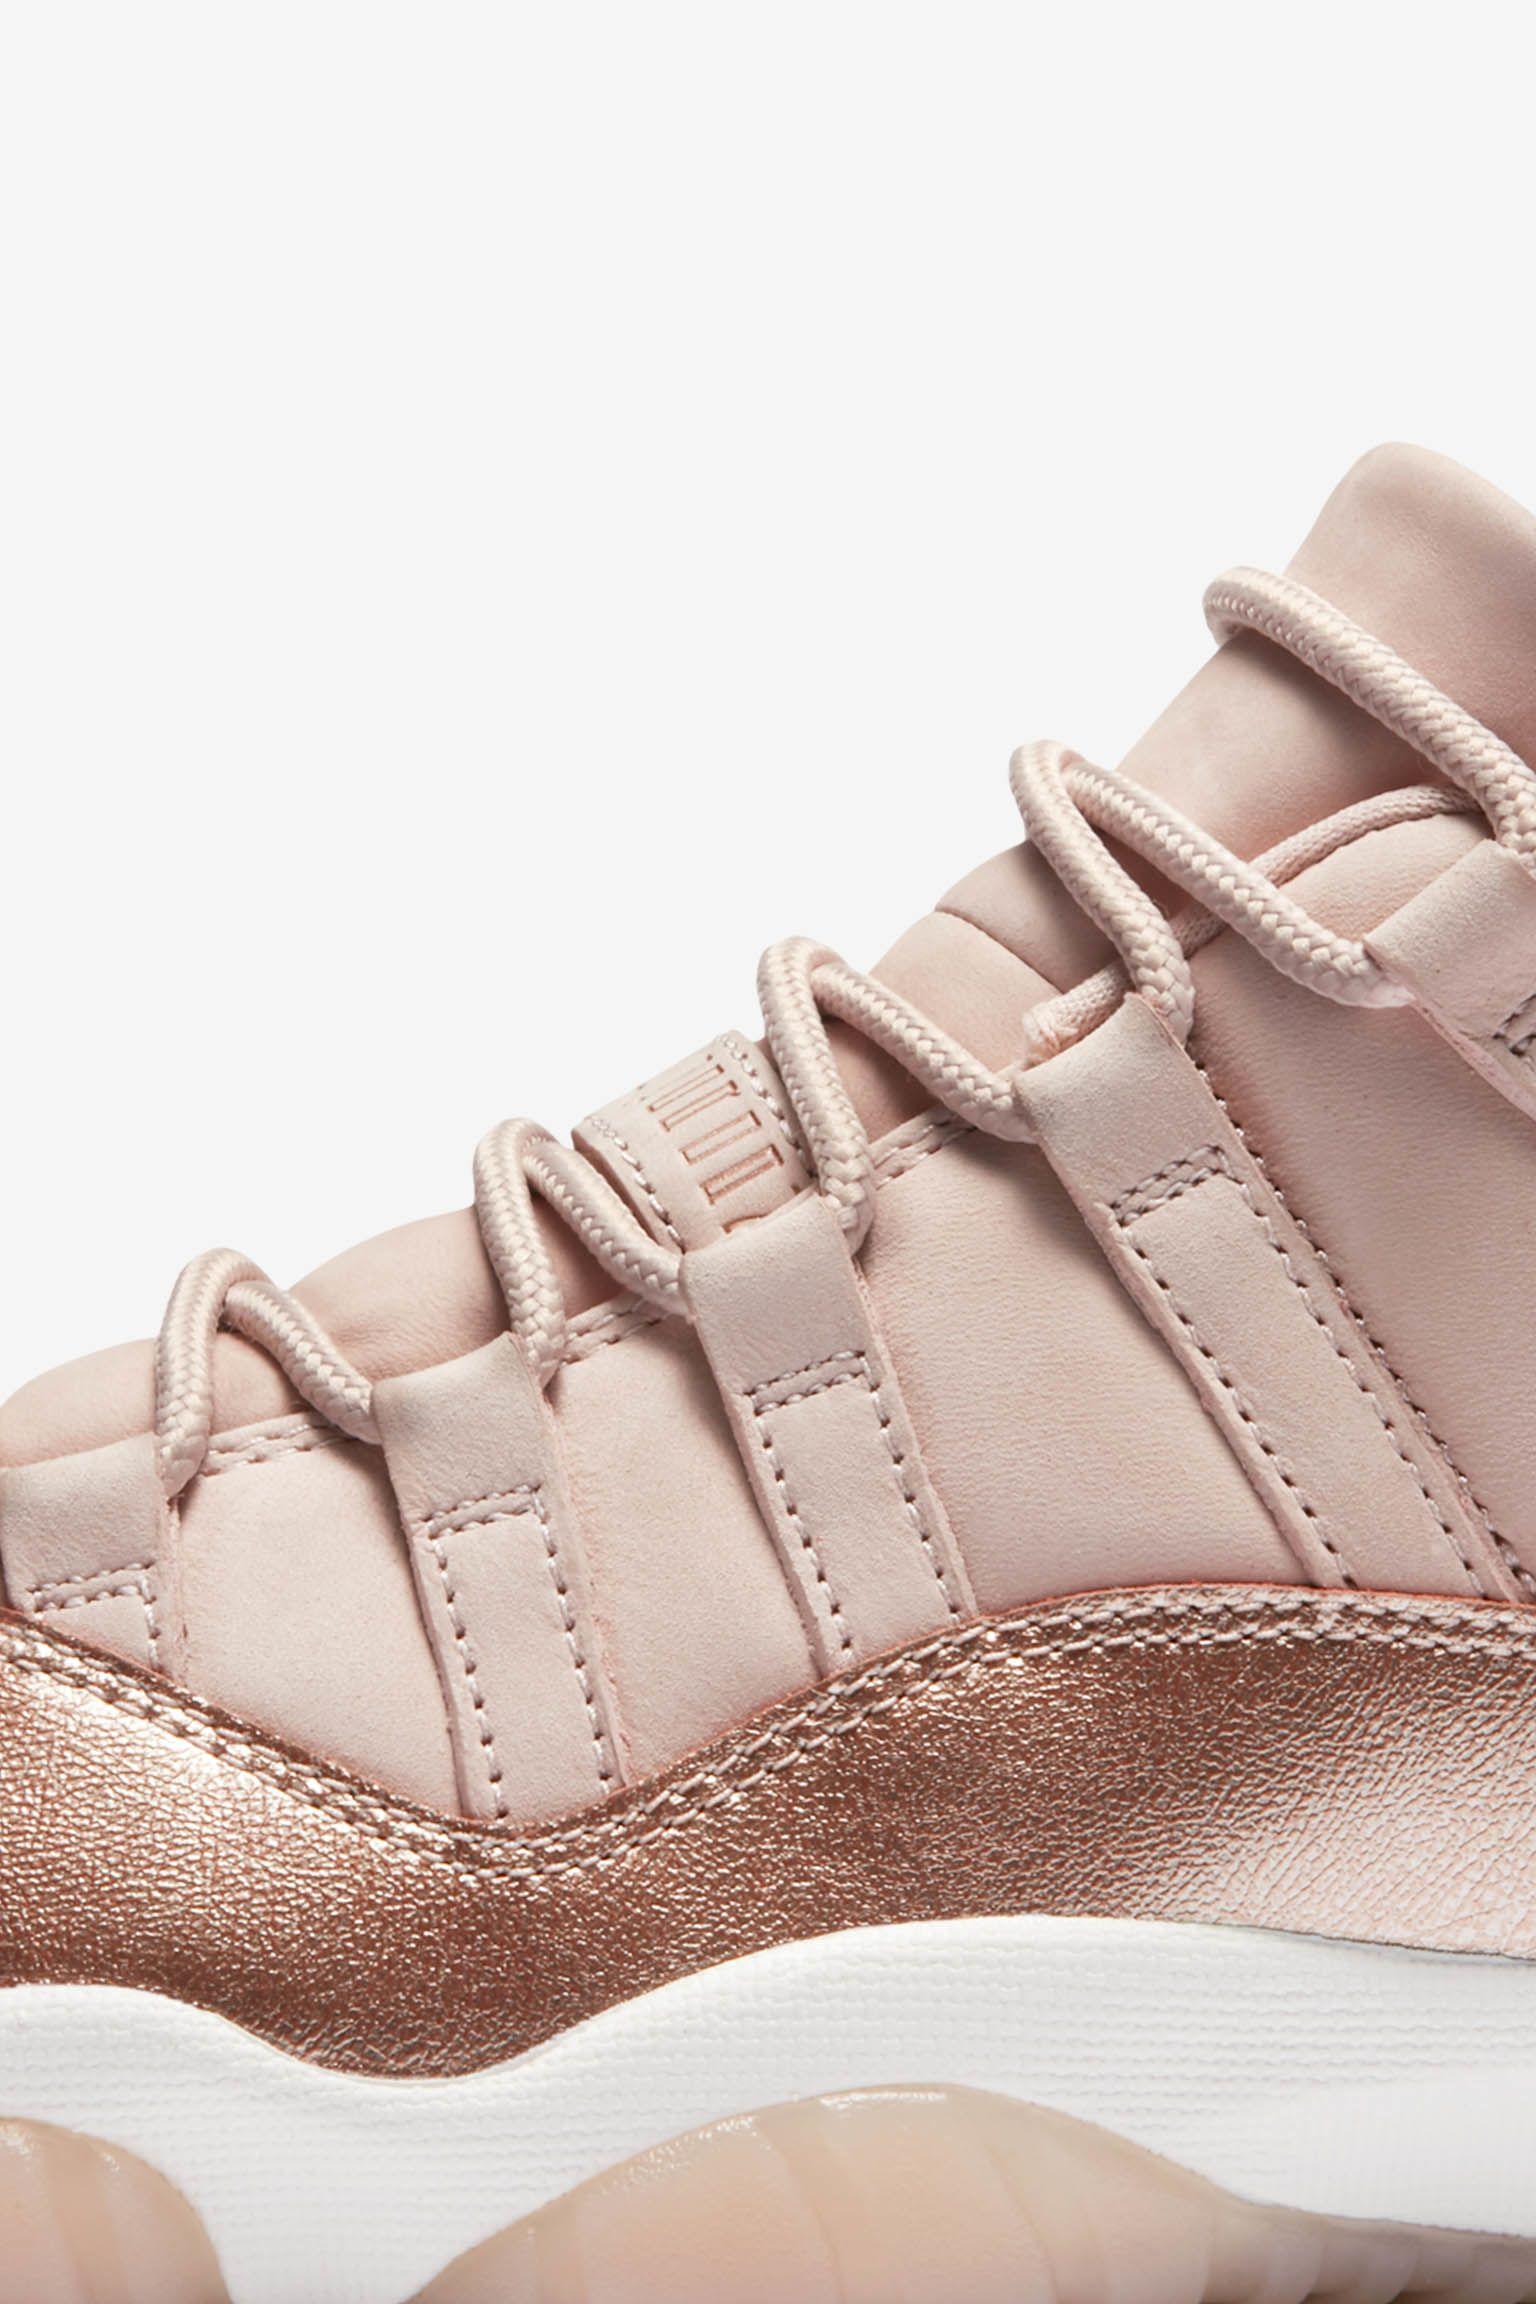 051f3712e21 Women's Air Jordan 11 'Rose Gold' Release Date. Nike+ SNKRS